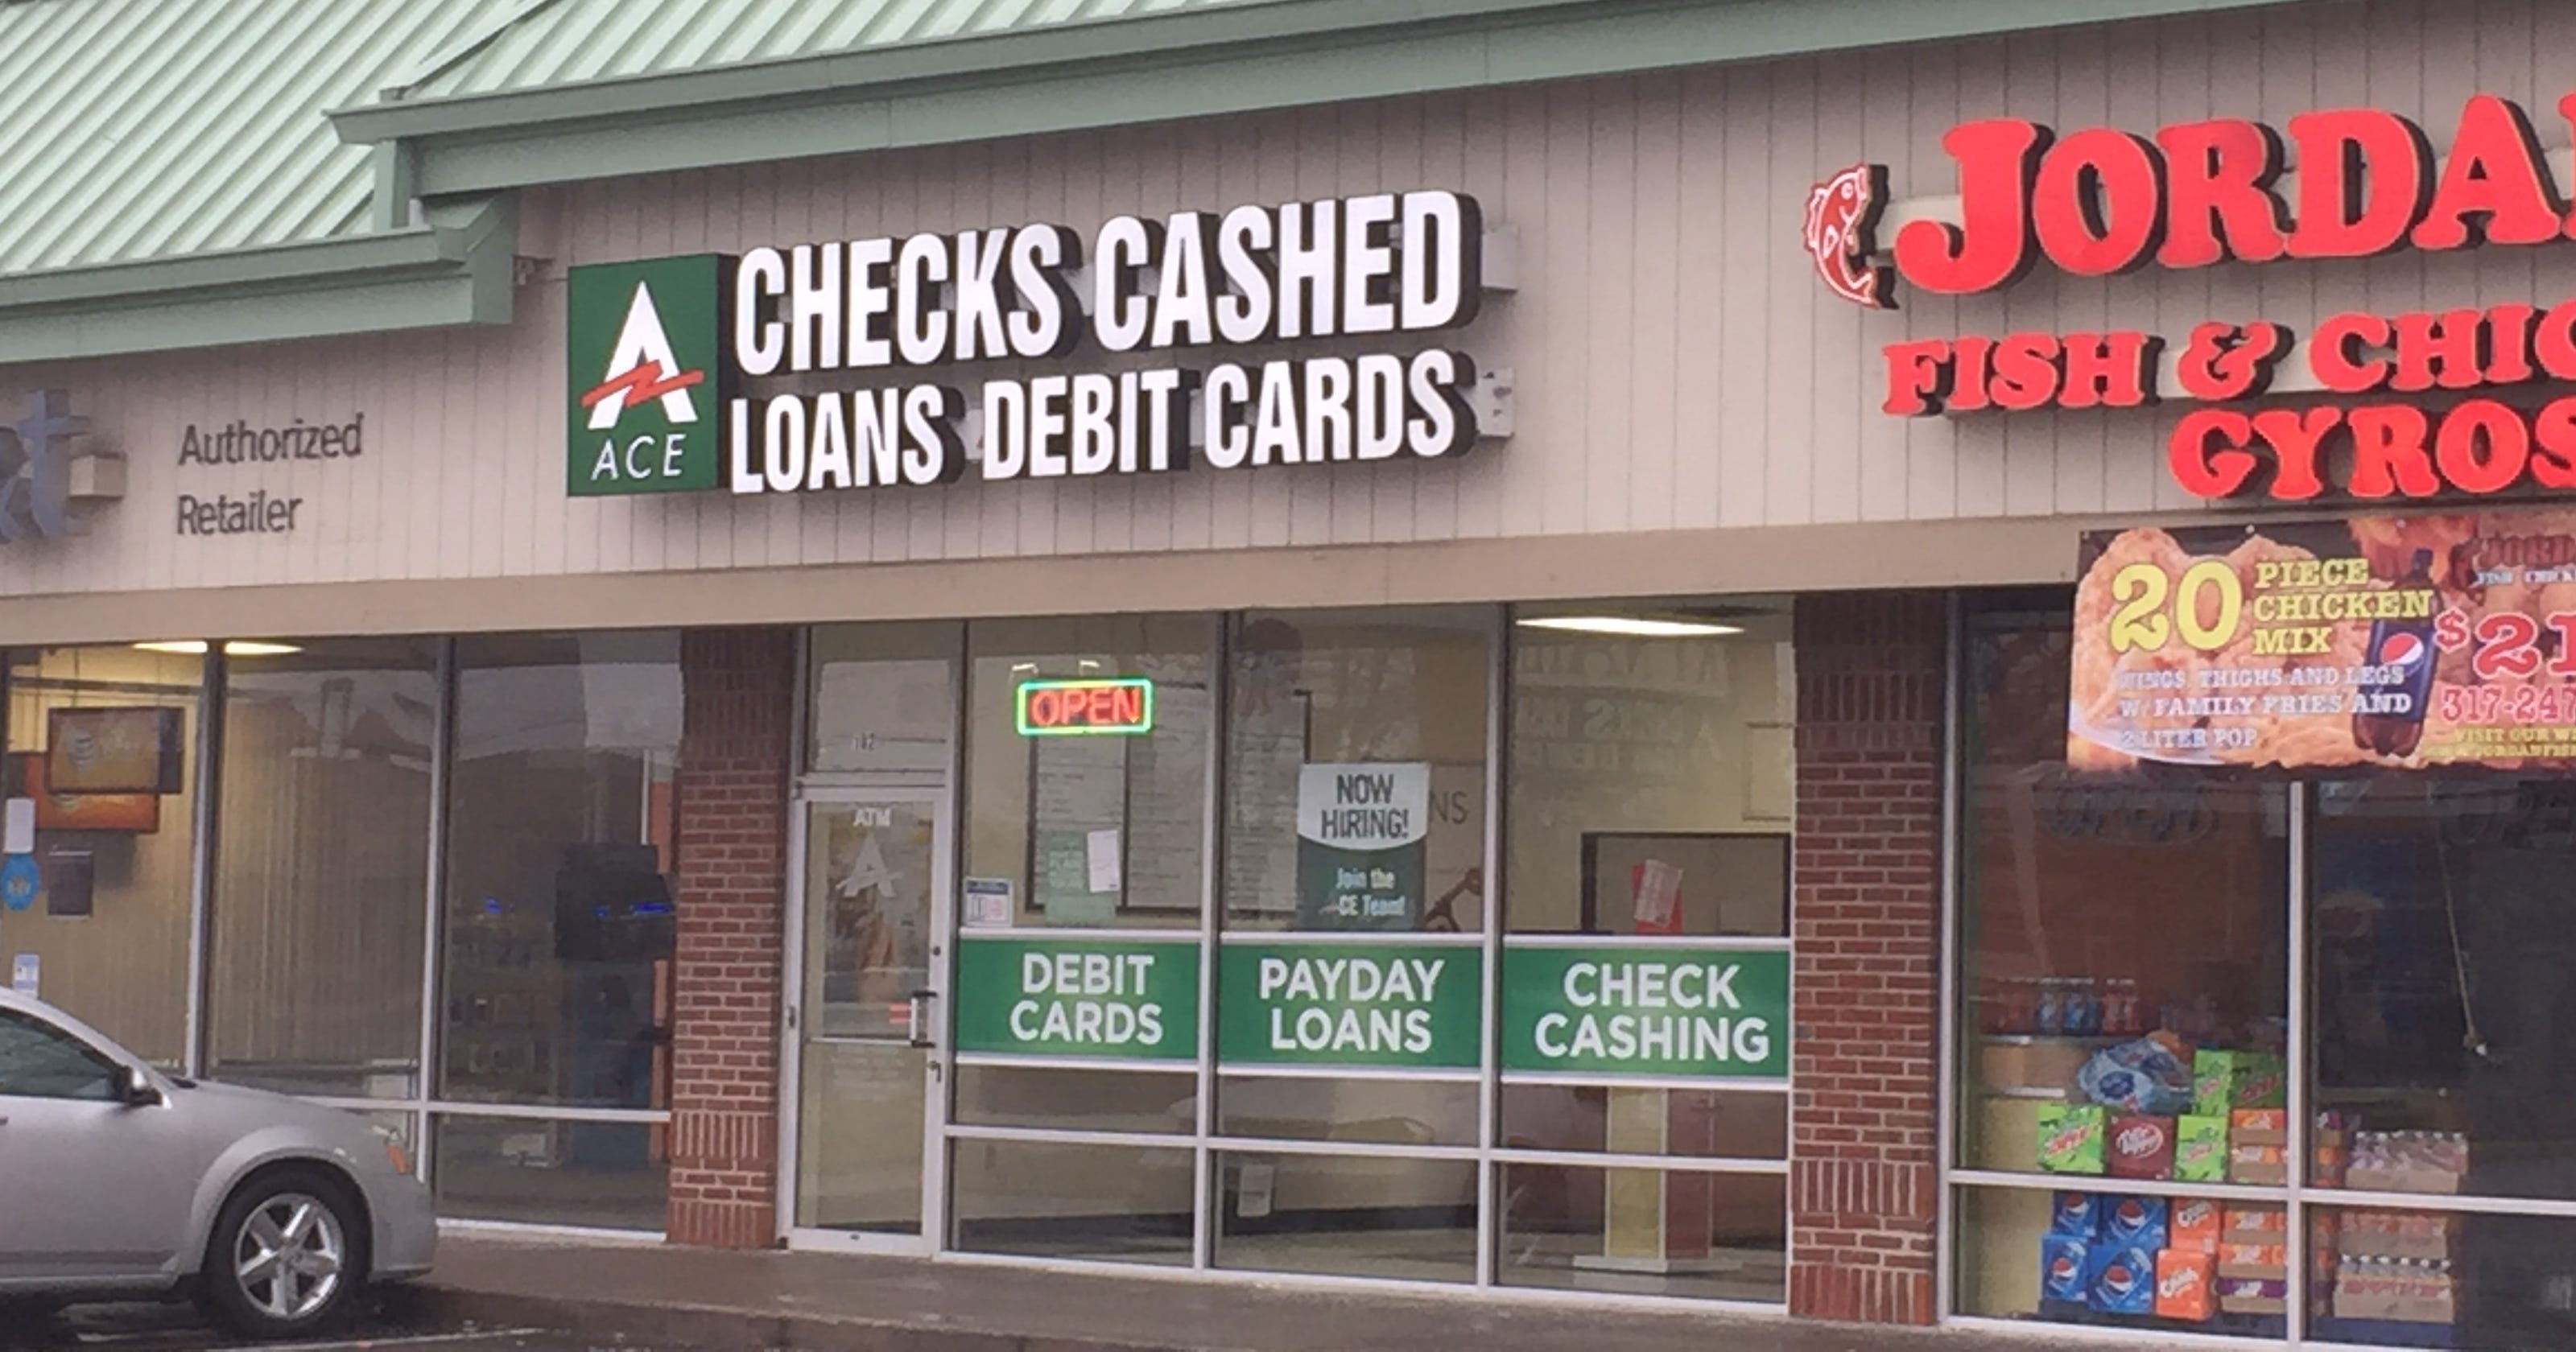 $605 Fast Payday Loans no Credit Check